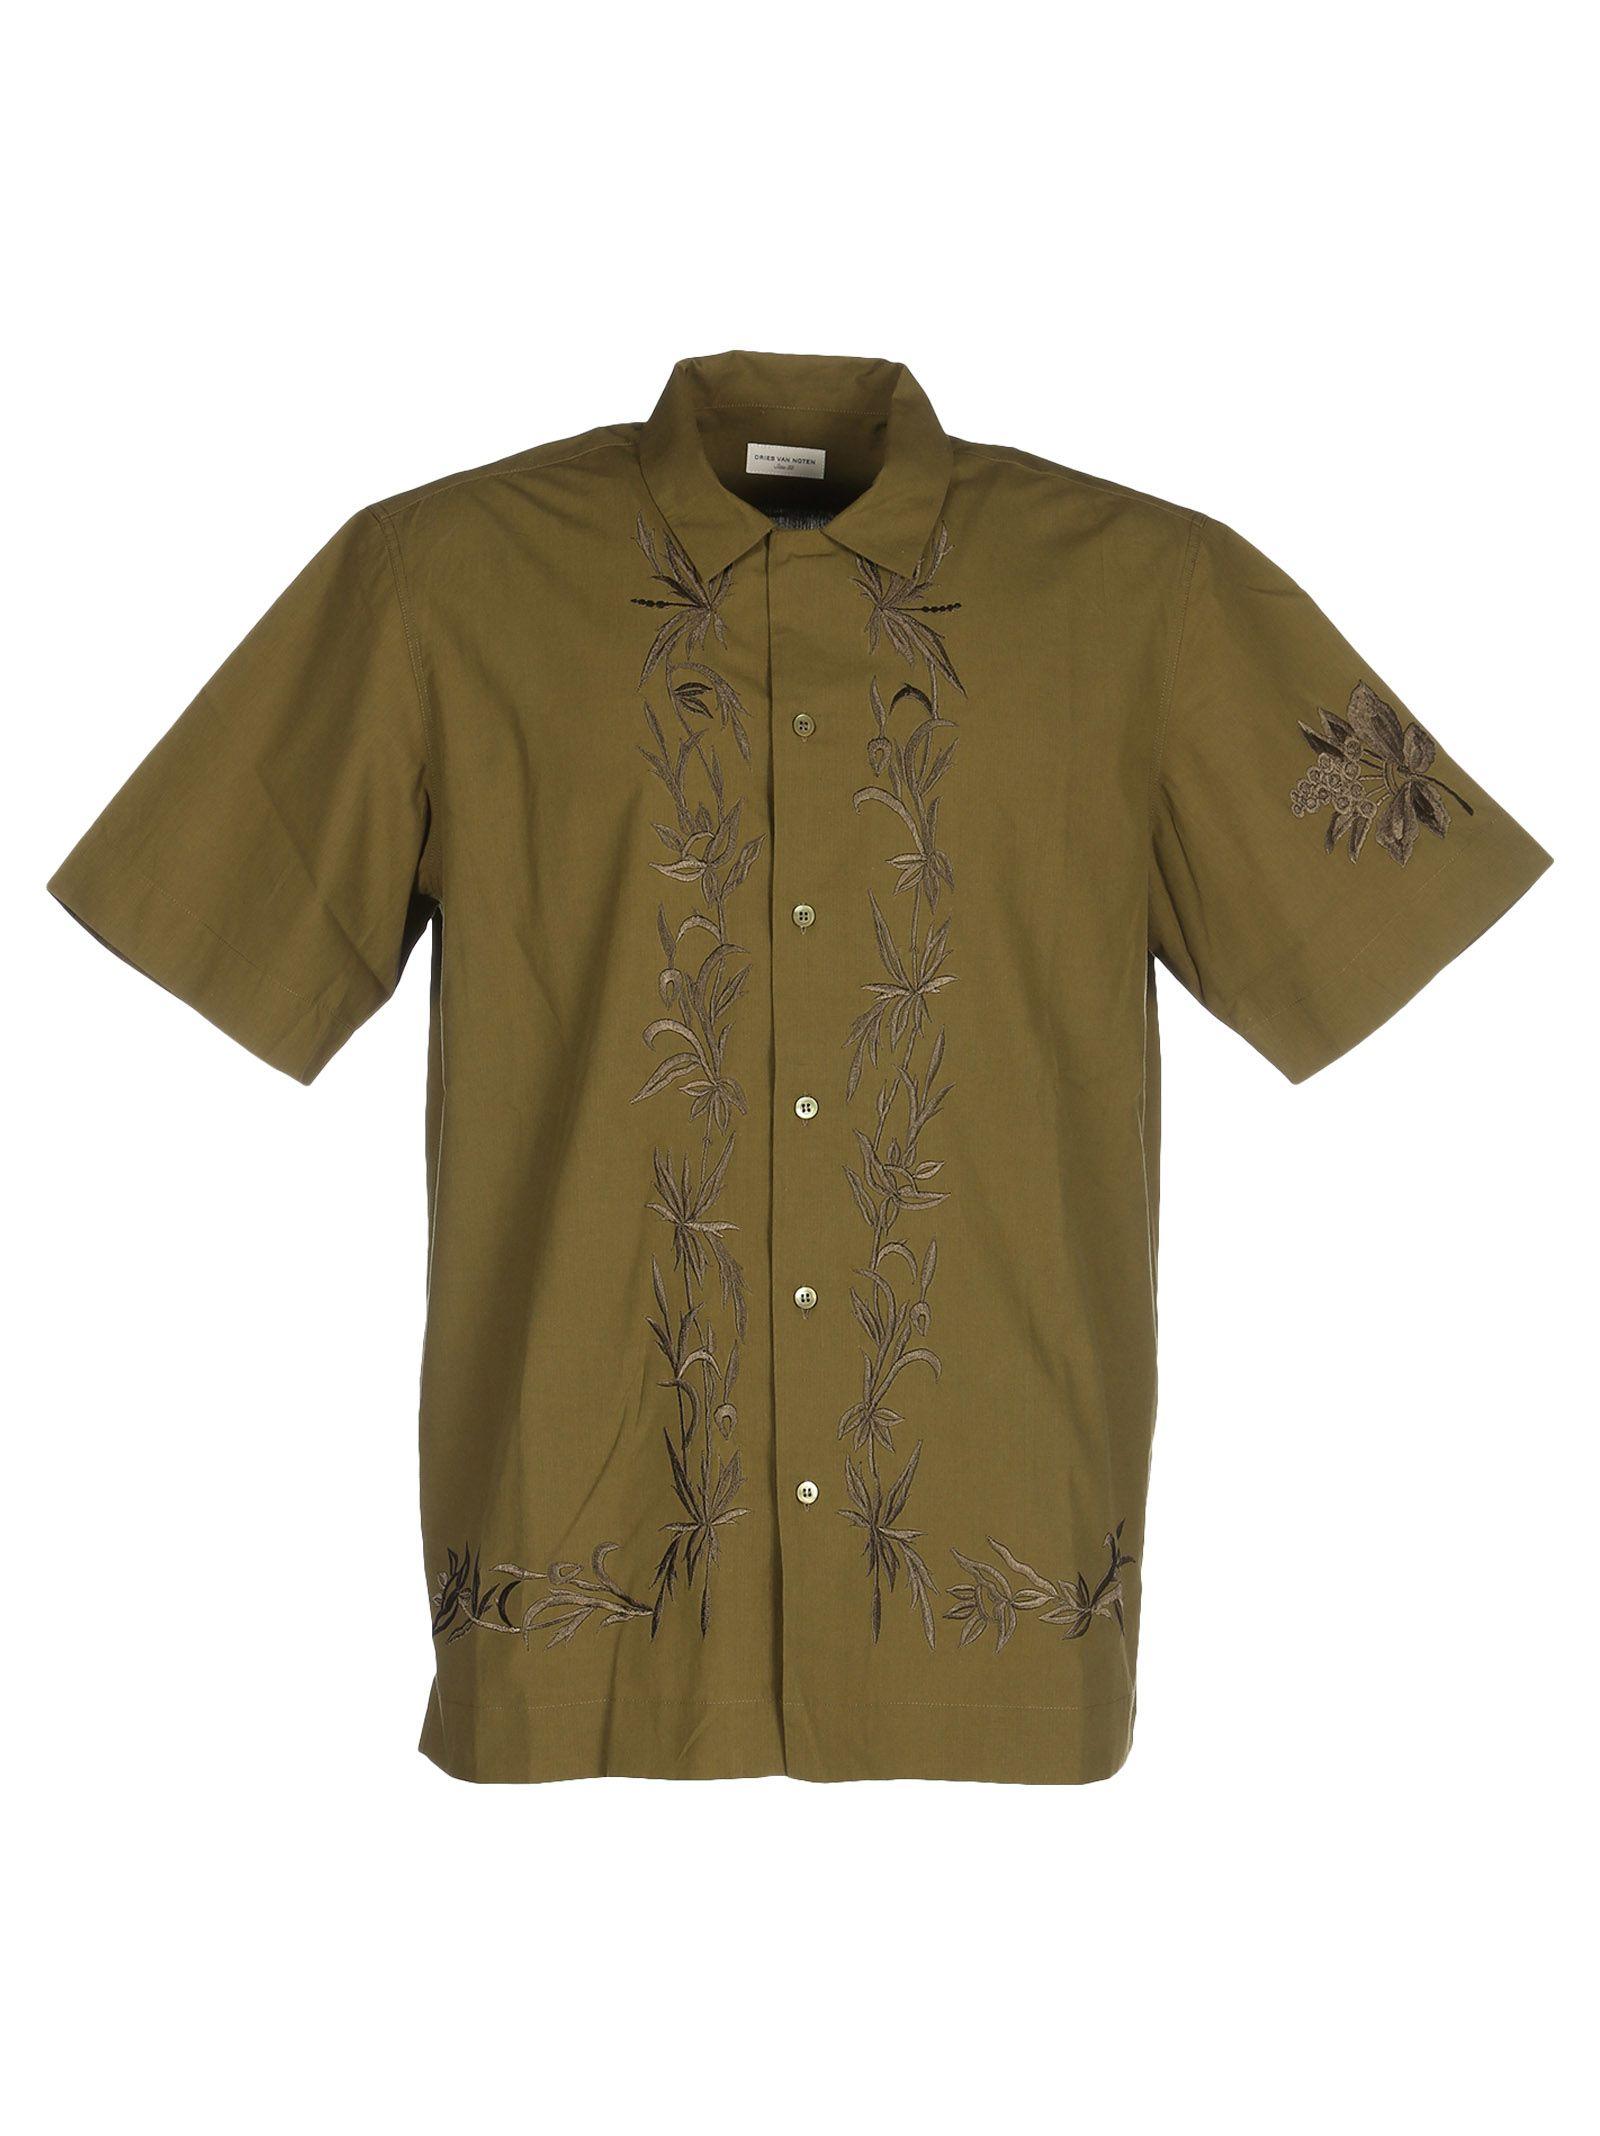 Dries Van Noten Embroidered Short-sleeve Shirt